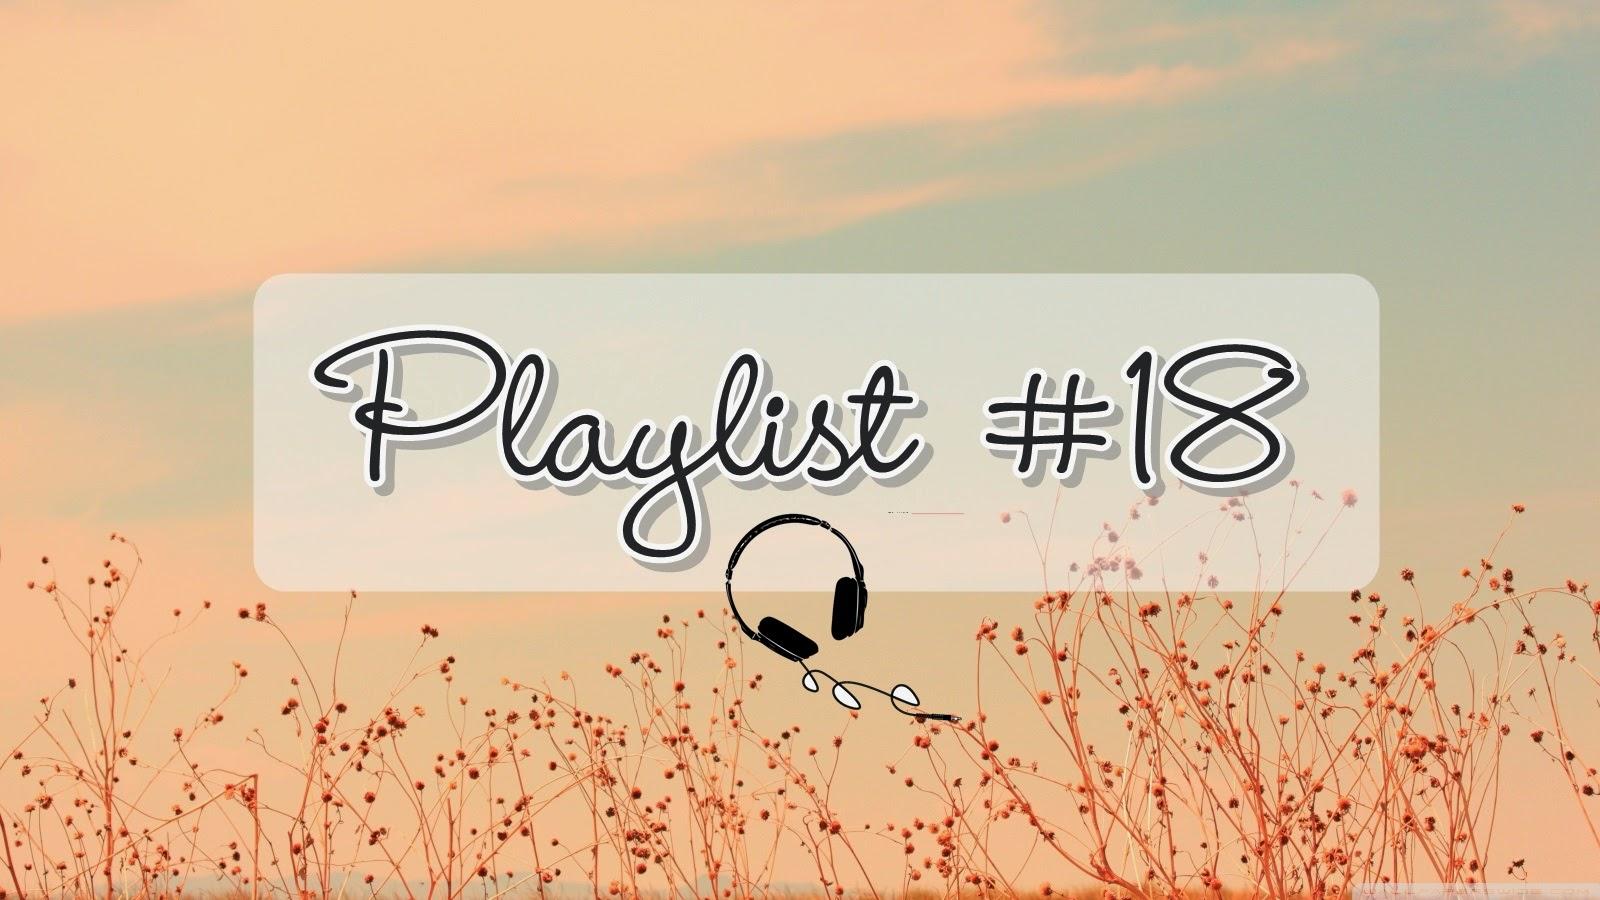 PLAYLIST, PLAYLIST DA SEMANA, MÚSICA, MUSIC,